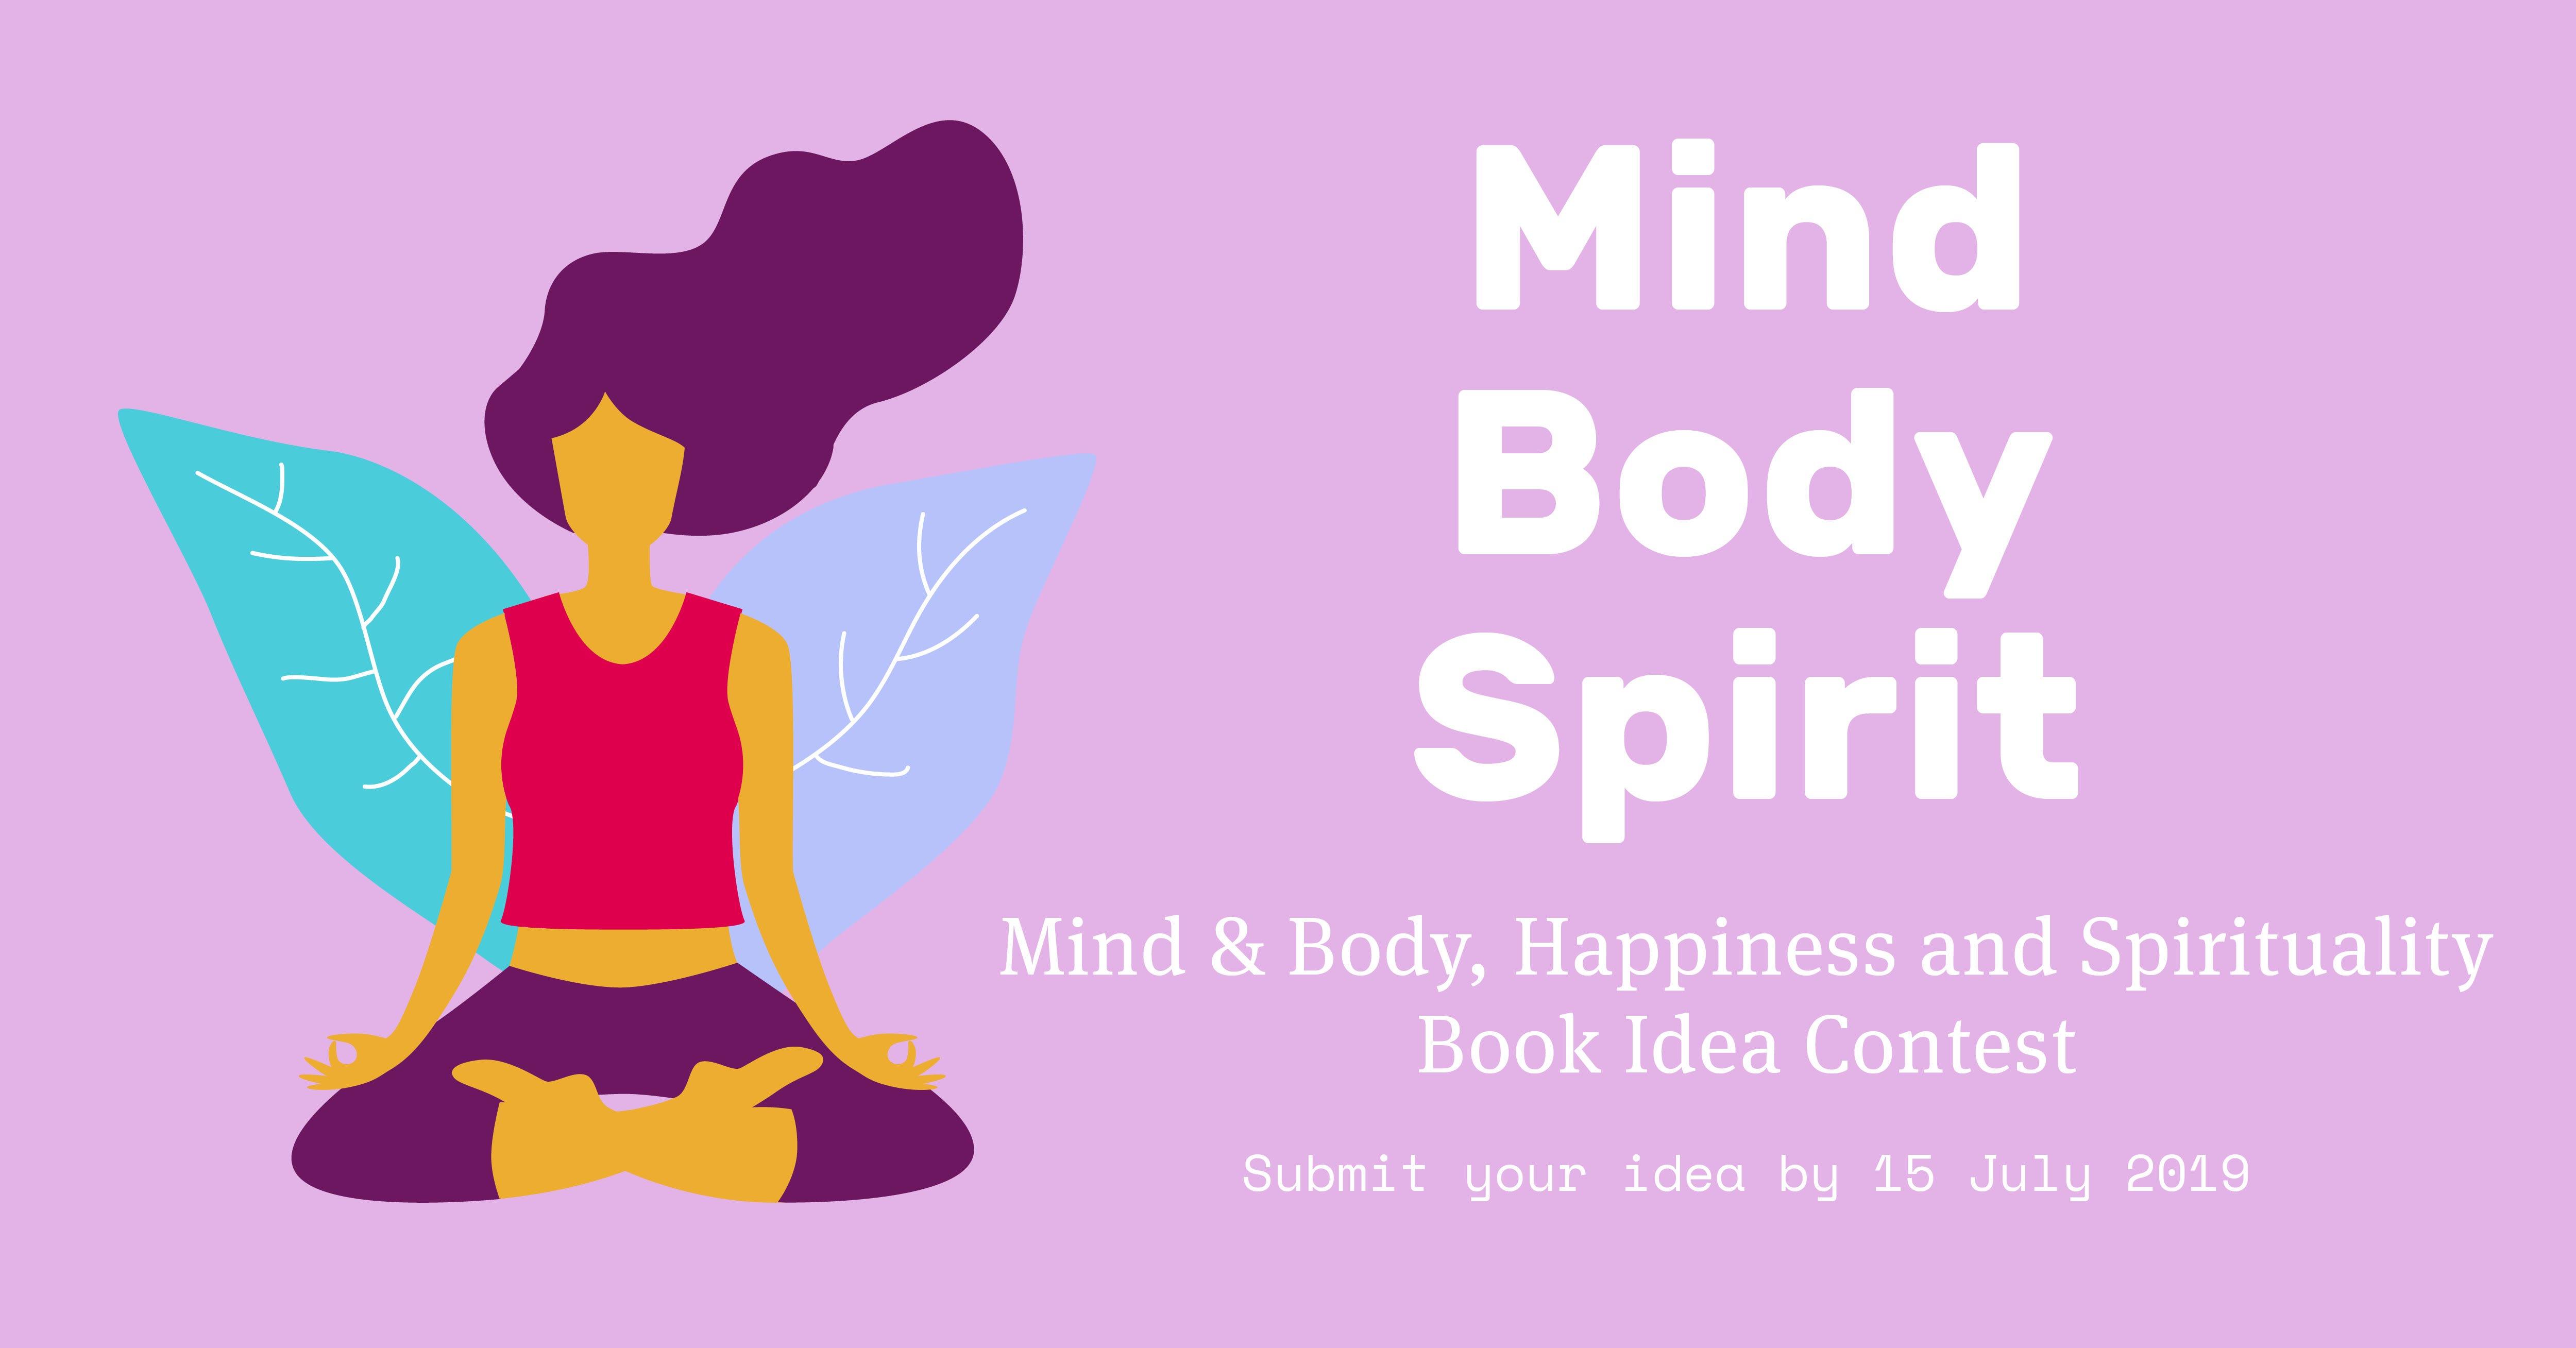 Mind Body Spirit Book Proposal Writing Contest